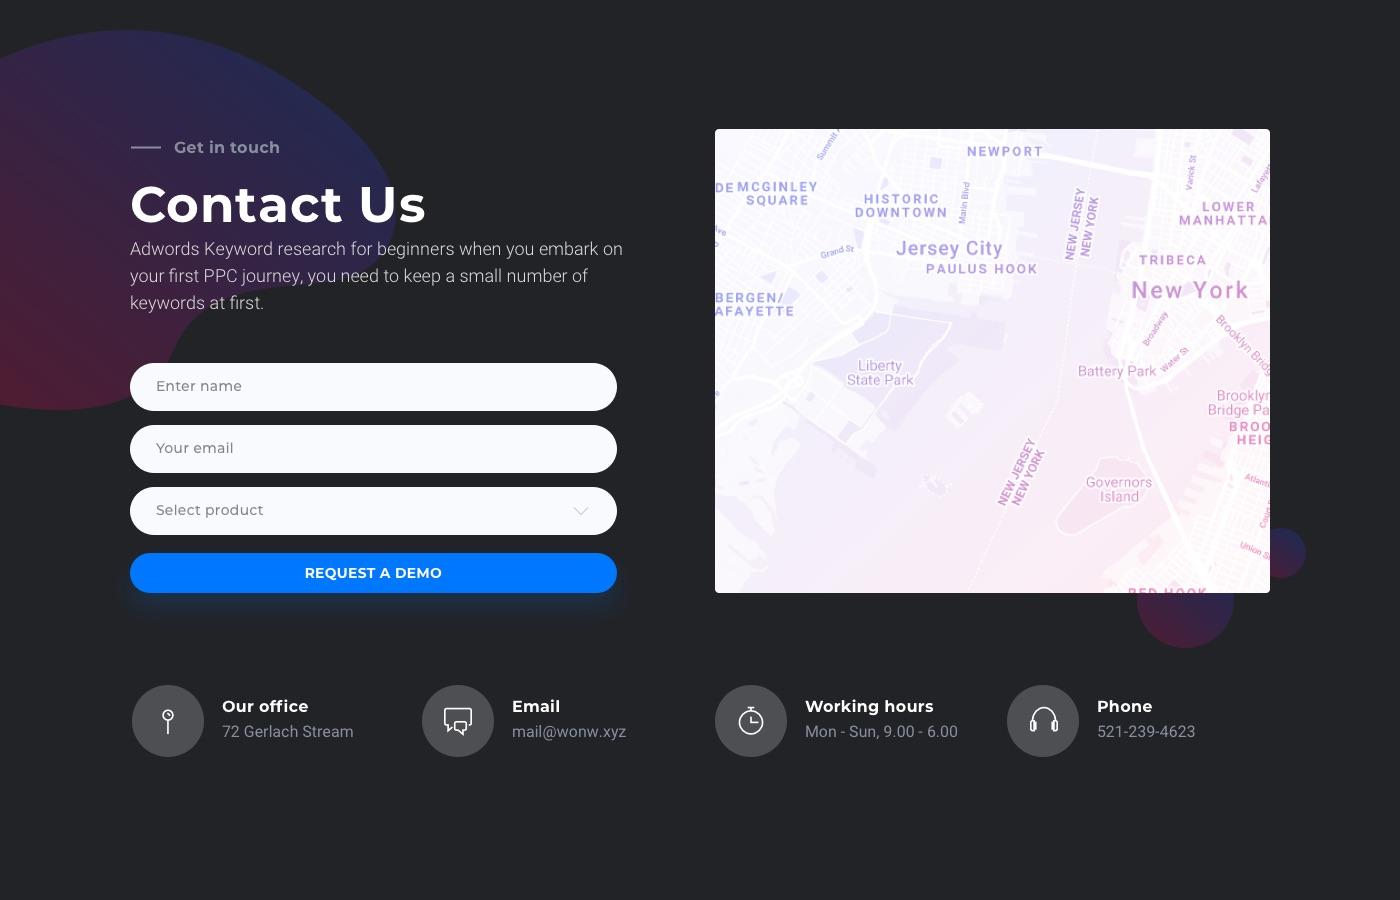 Cardify Contact Us